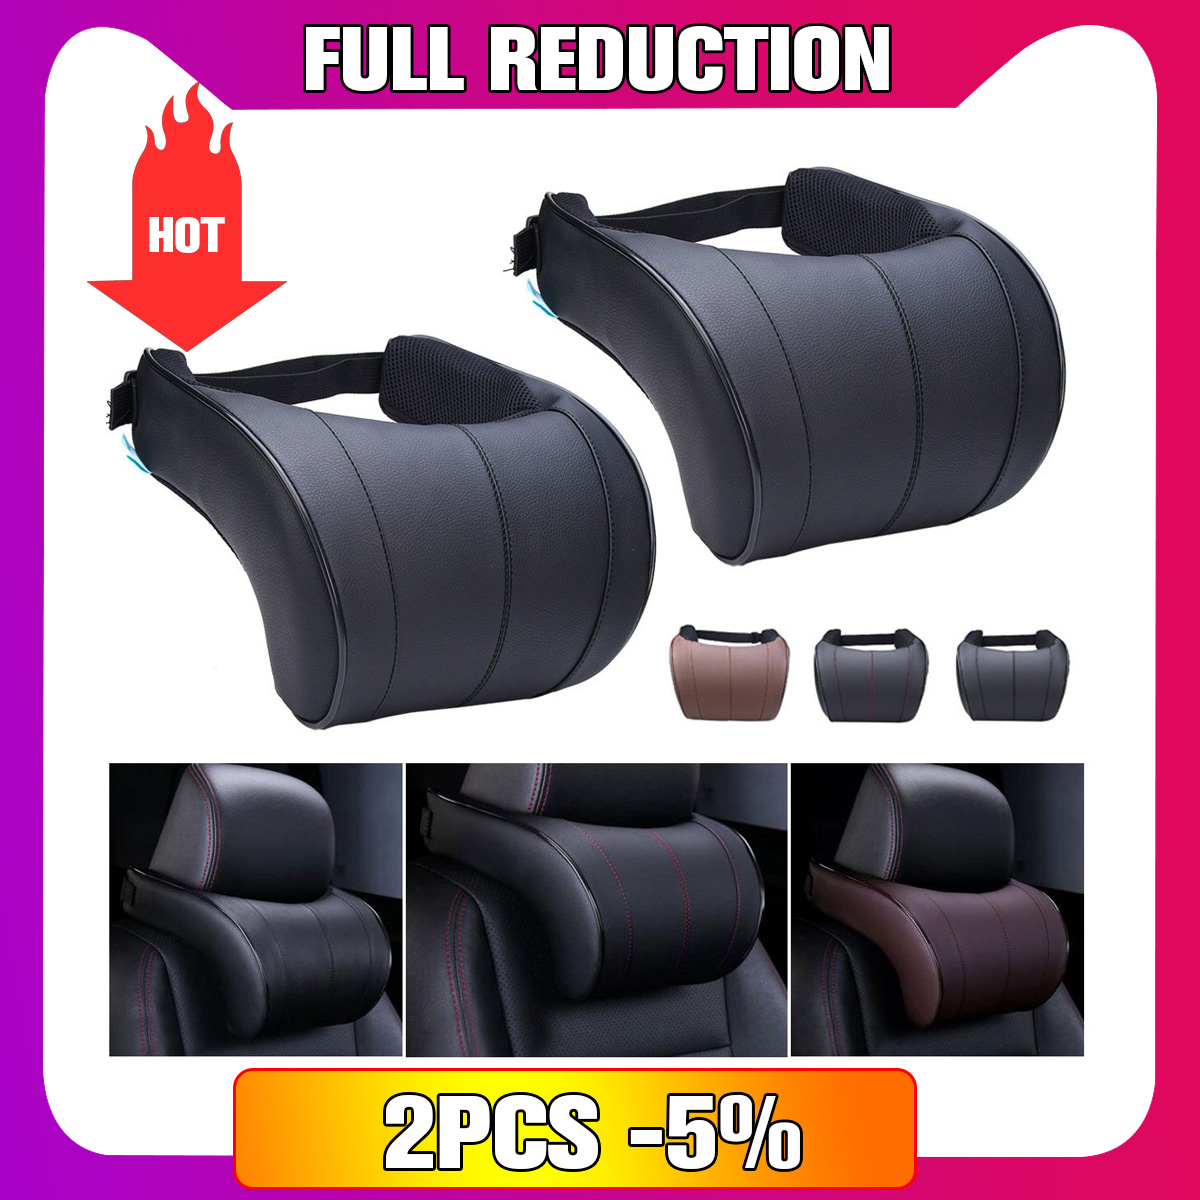 Cushion-Pad Pillows Seat Headrest Neck-Rest Memory-Foam Auto 3-Colors 1PCS High-Quality